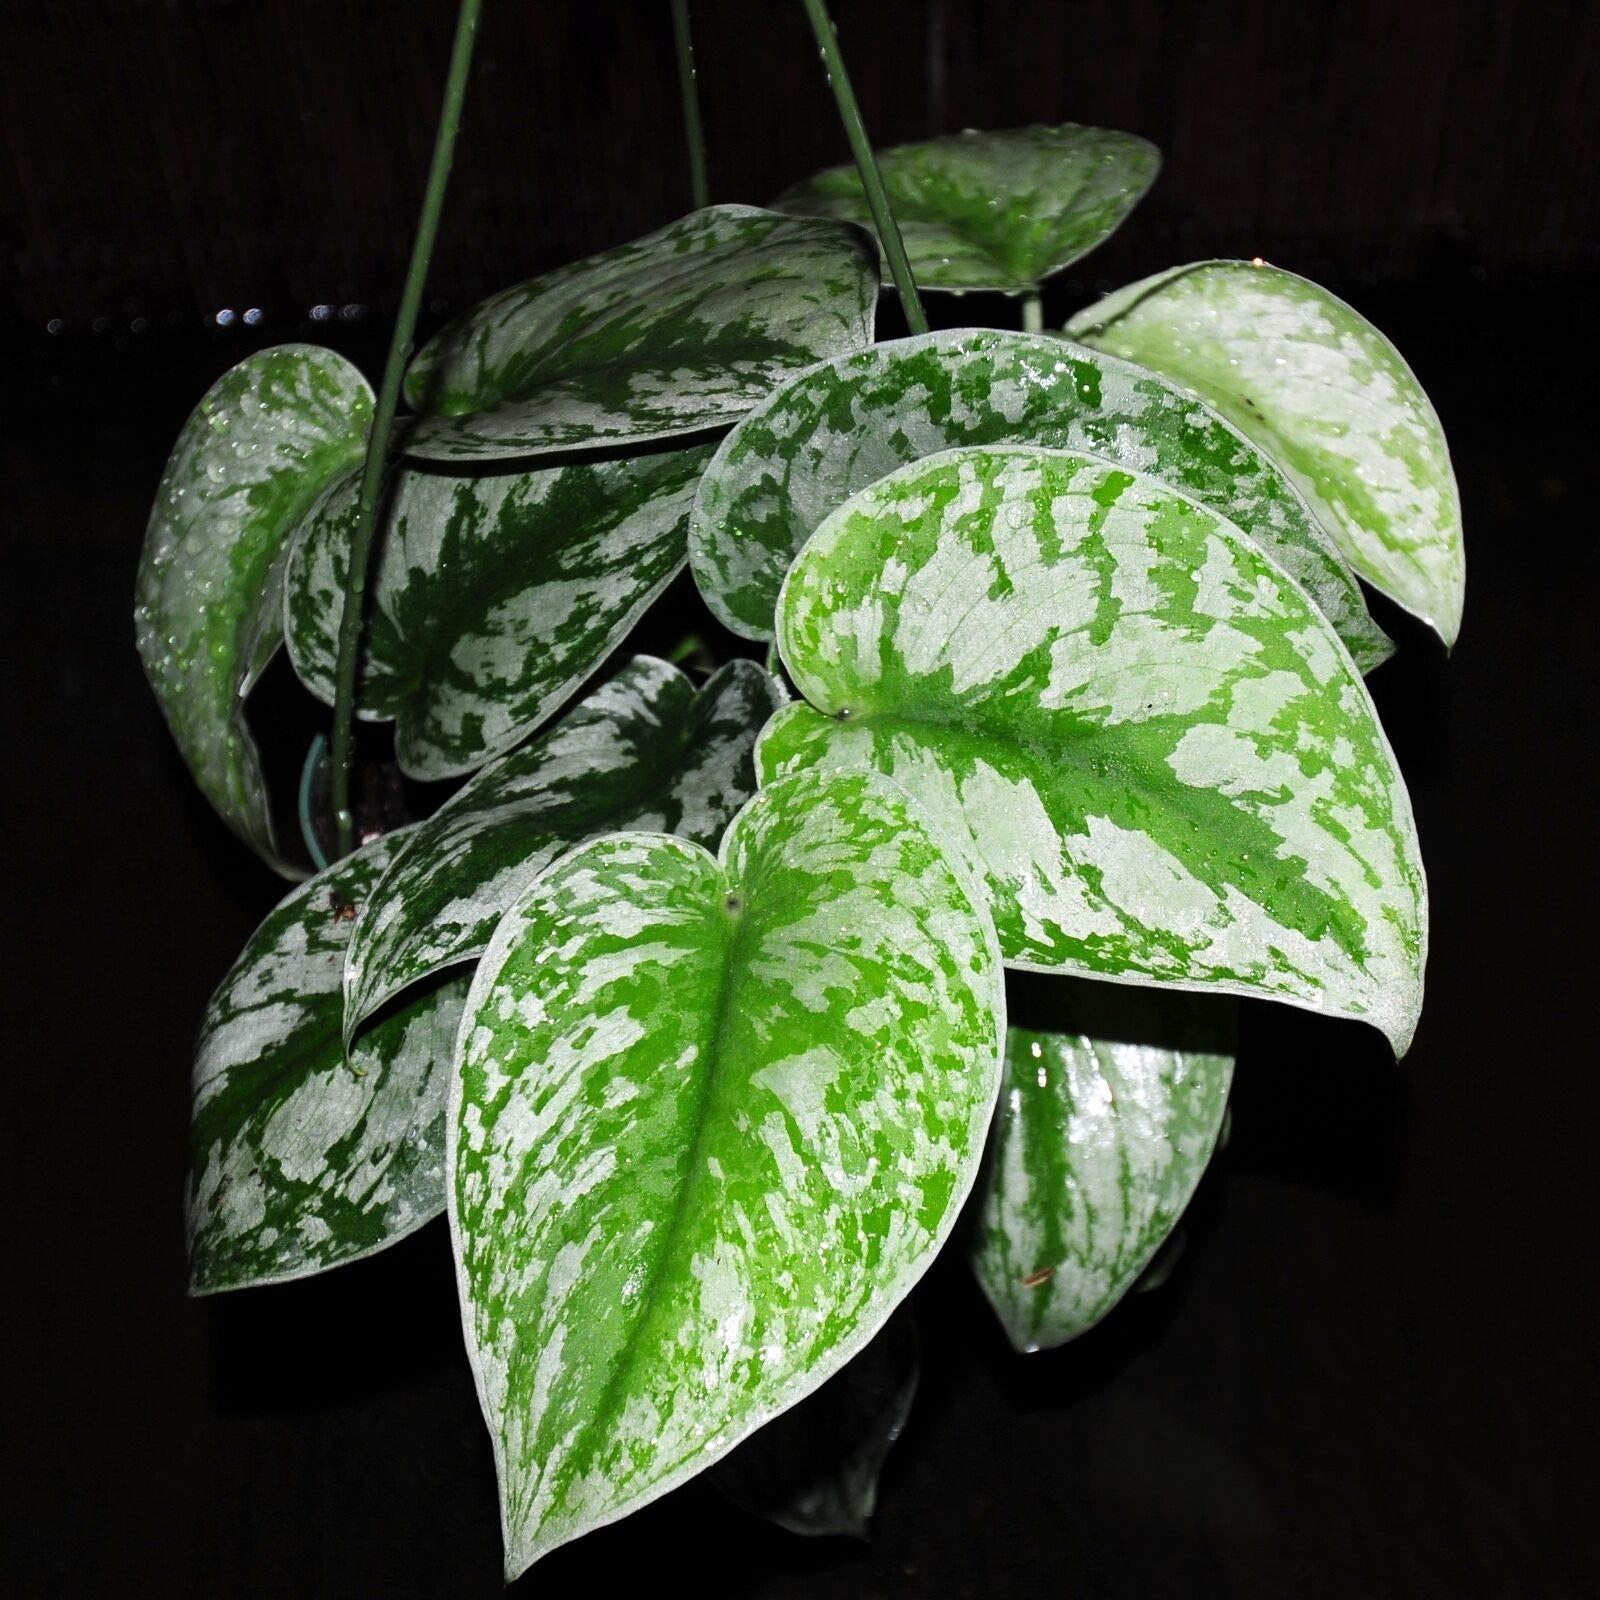 Sale~Silver Satin Pothos 'Scindapsus Pictus' 5'' Hanging Basket Houseplant (Premium Quality) by AY-Premium